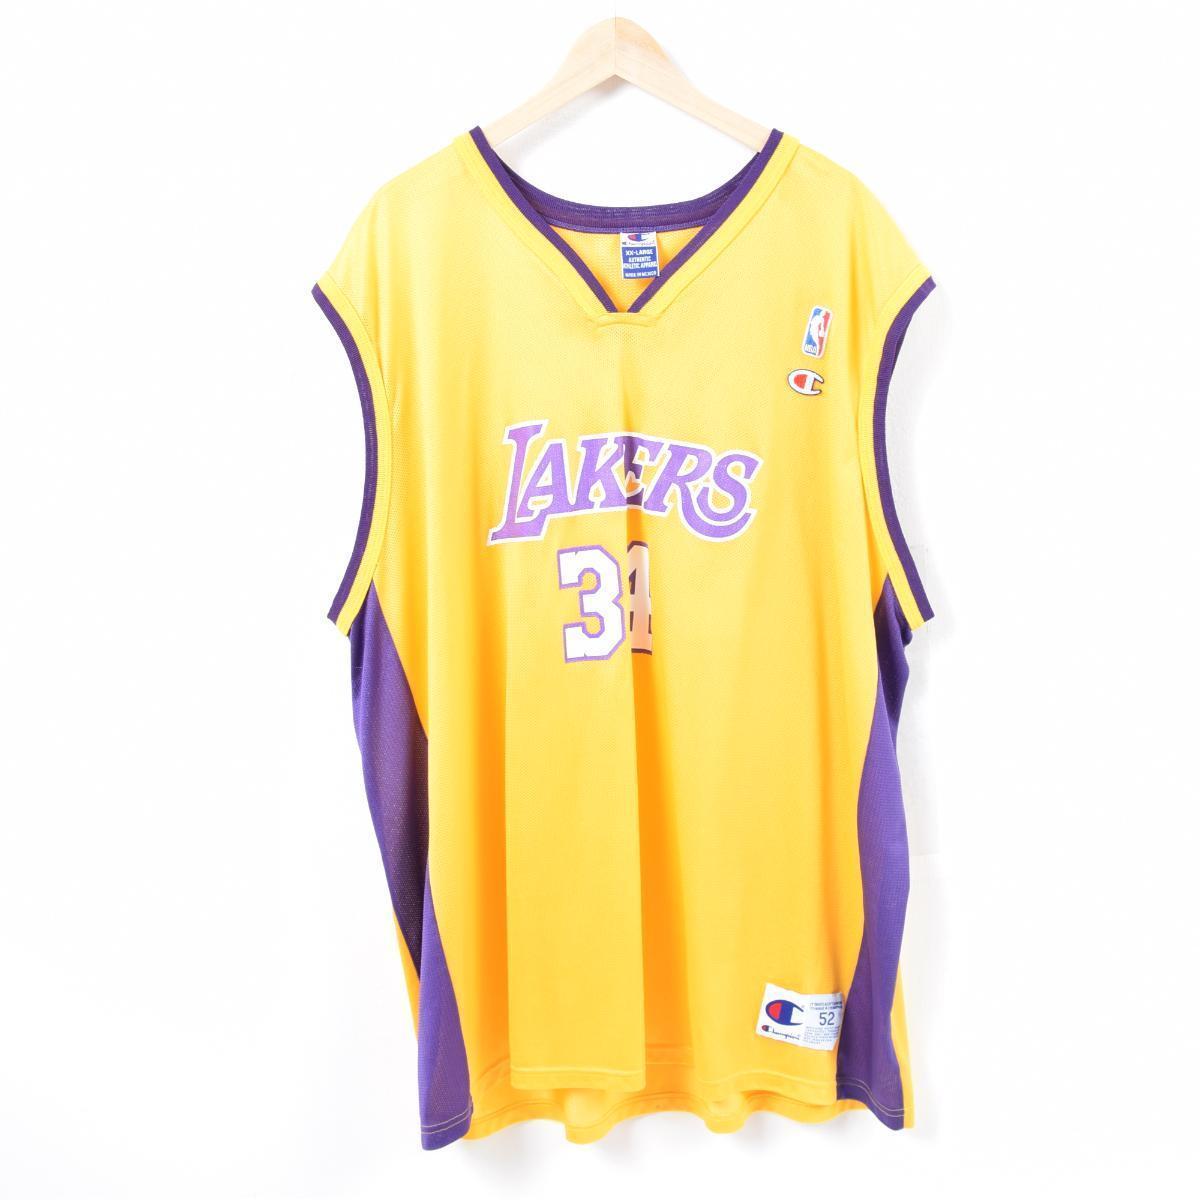 90s champion Champion NBA LOS ANGELES LAKERS Los Angeles Lakers Shaquille  O Neal Shaquille O Neal game shirt replica uniform men XXL  waq7262 2044b1102